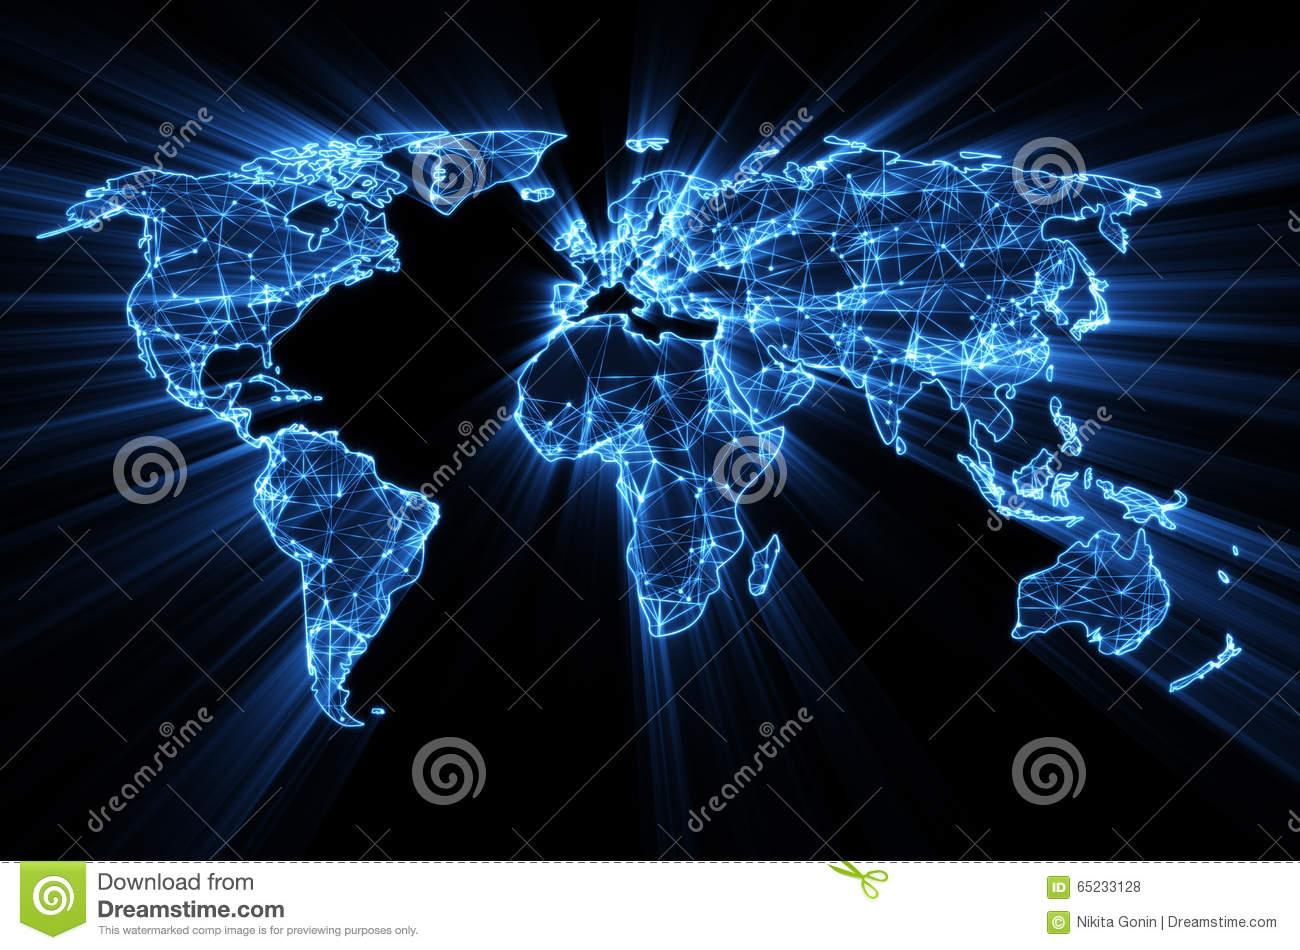 World Map Comp on world records, world atlas, world wallpaper, world flag, world history, world military, world earth, world border, world travel, world wide web, world globe, world war, world statistics, world projection, world hunger, world most beautiful nature, world shipping lanes, world glode, world of warships, world culture,